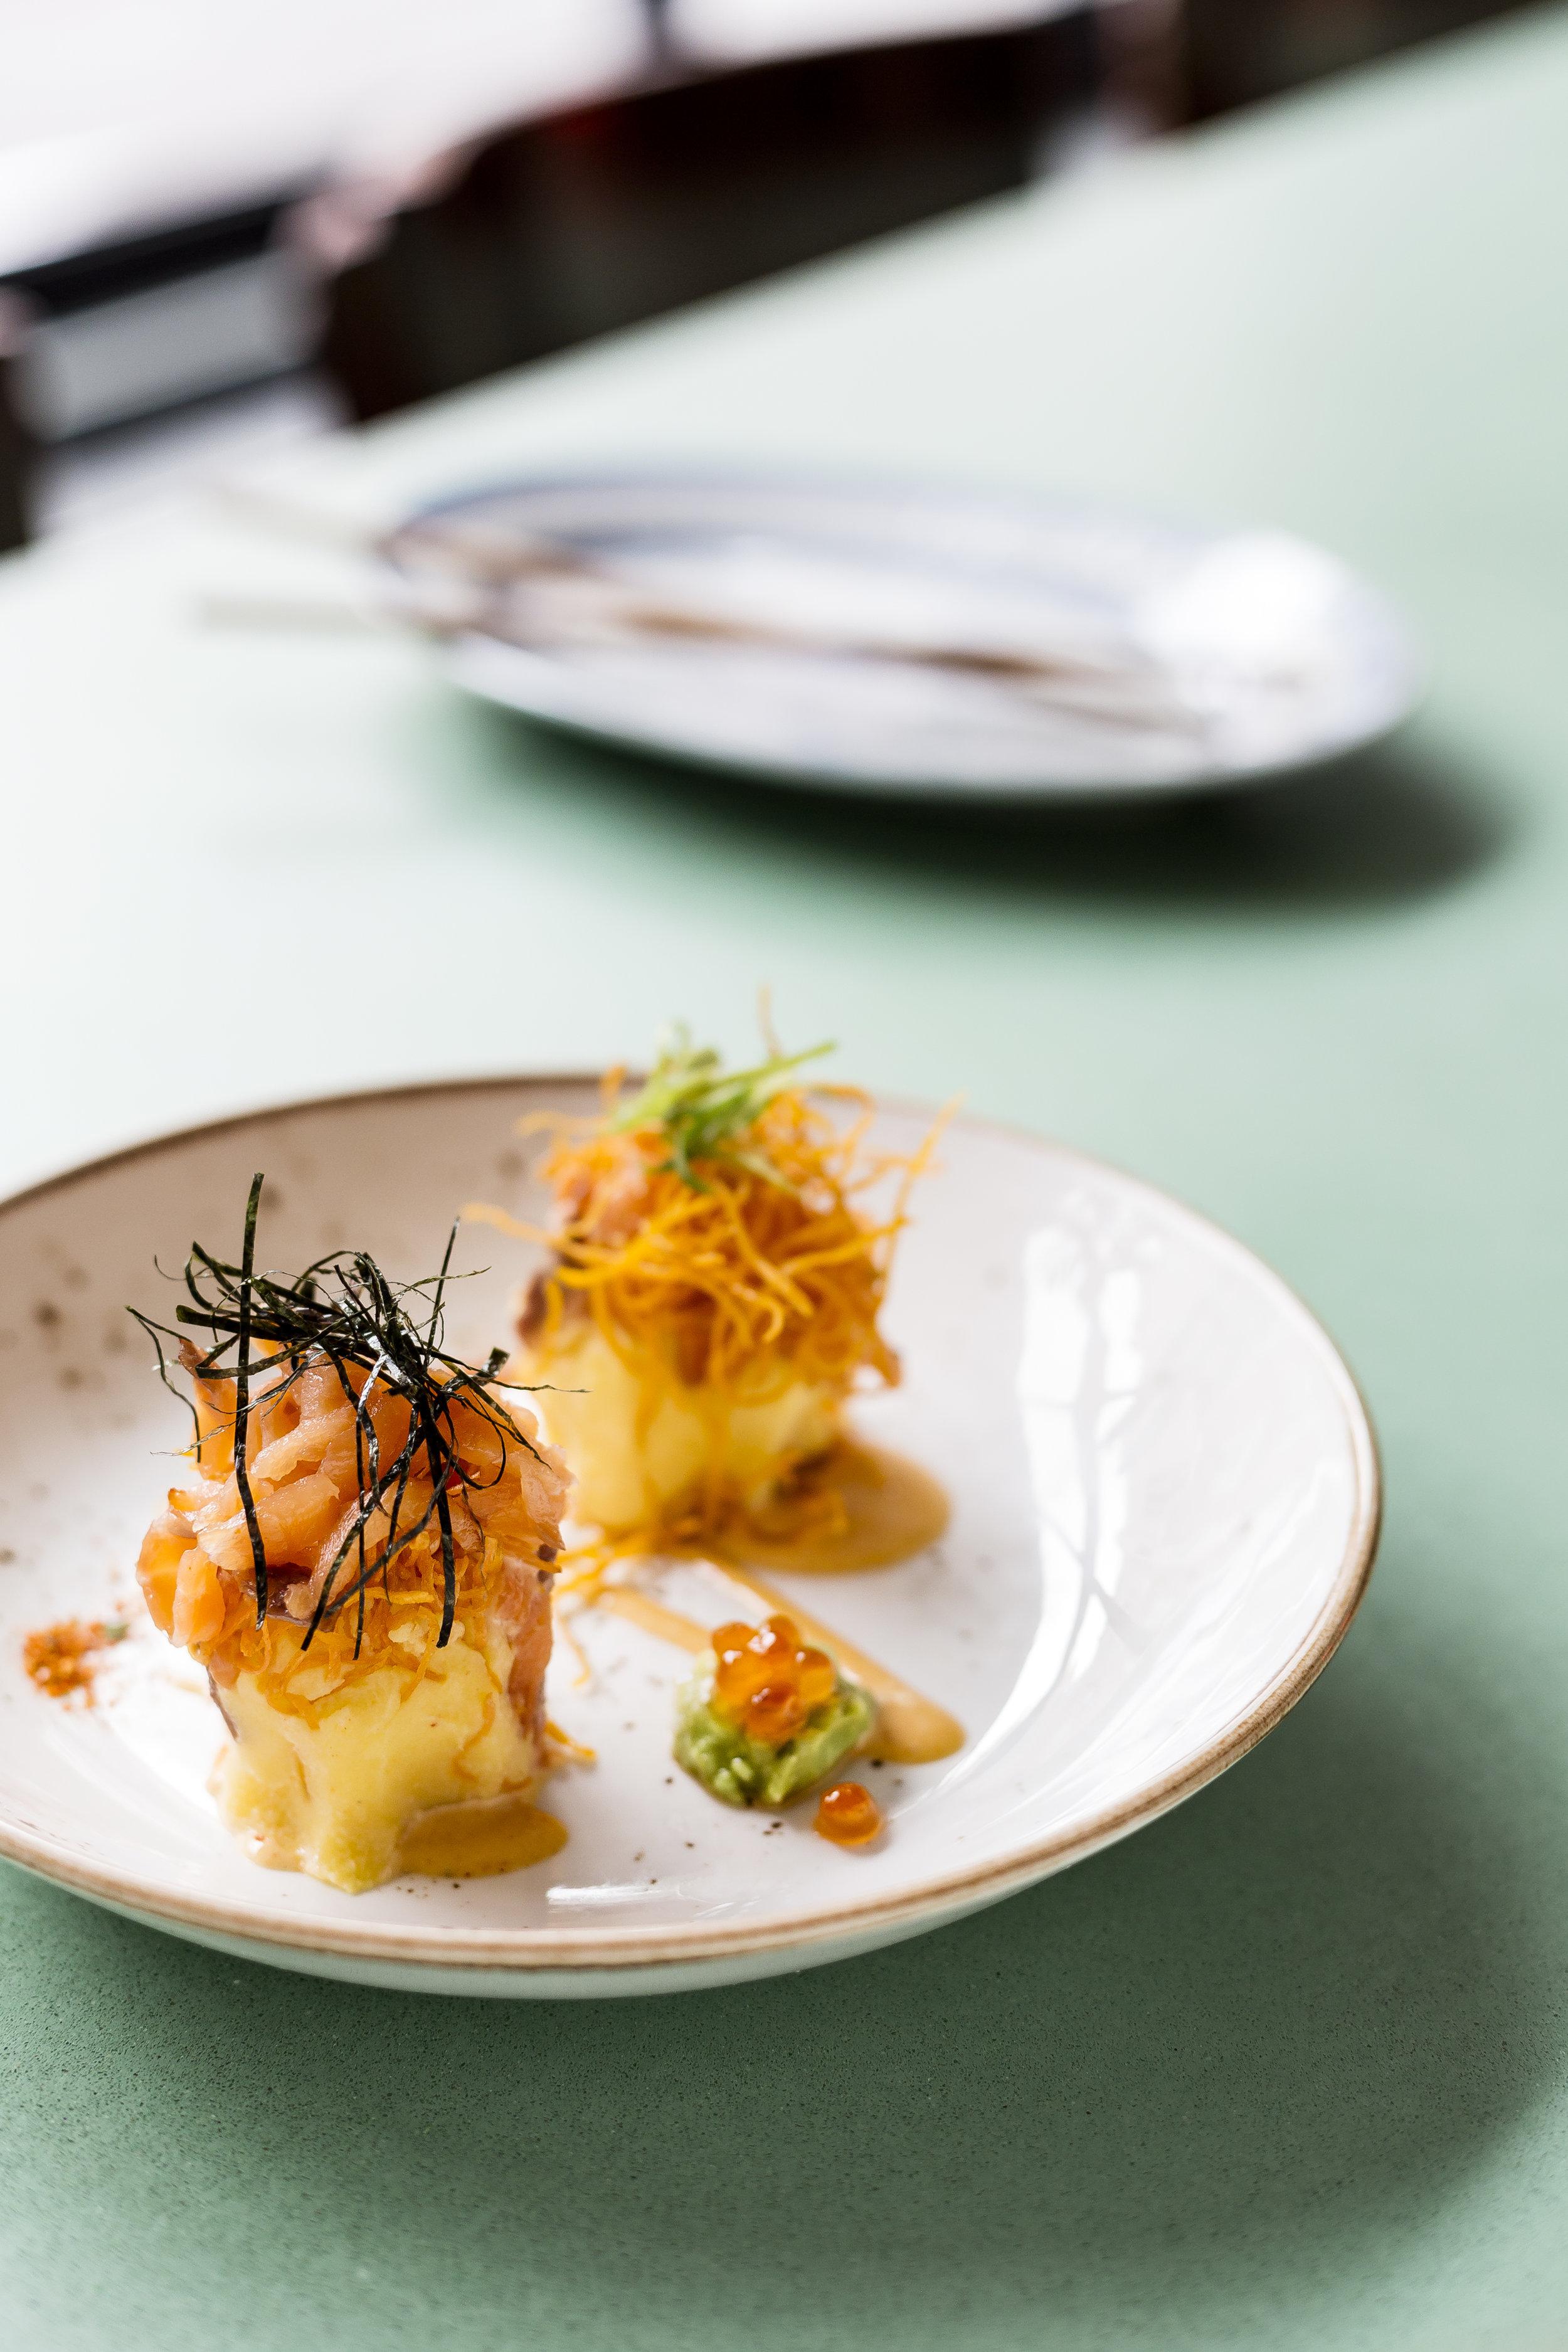 keven poisson-photographie culinaire-photographe montreal-tiradito-bar montreal-bar downtown montreal-bar peruvien-montreal restaurant-restaurants montréal-lifestyle-lifestyle blog-food blog